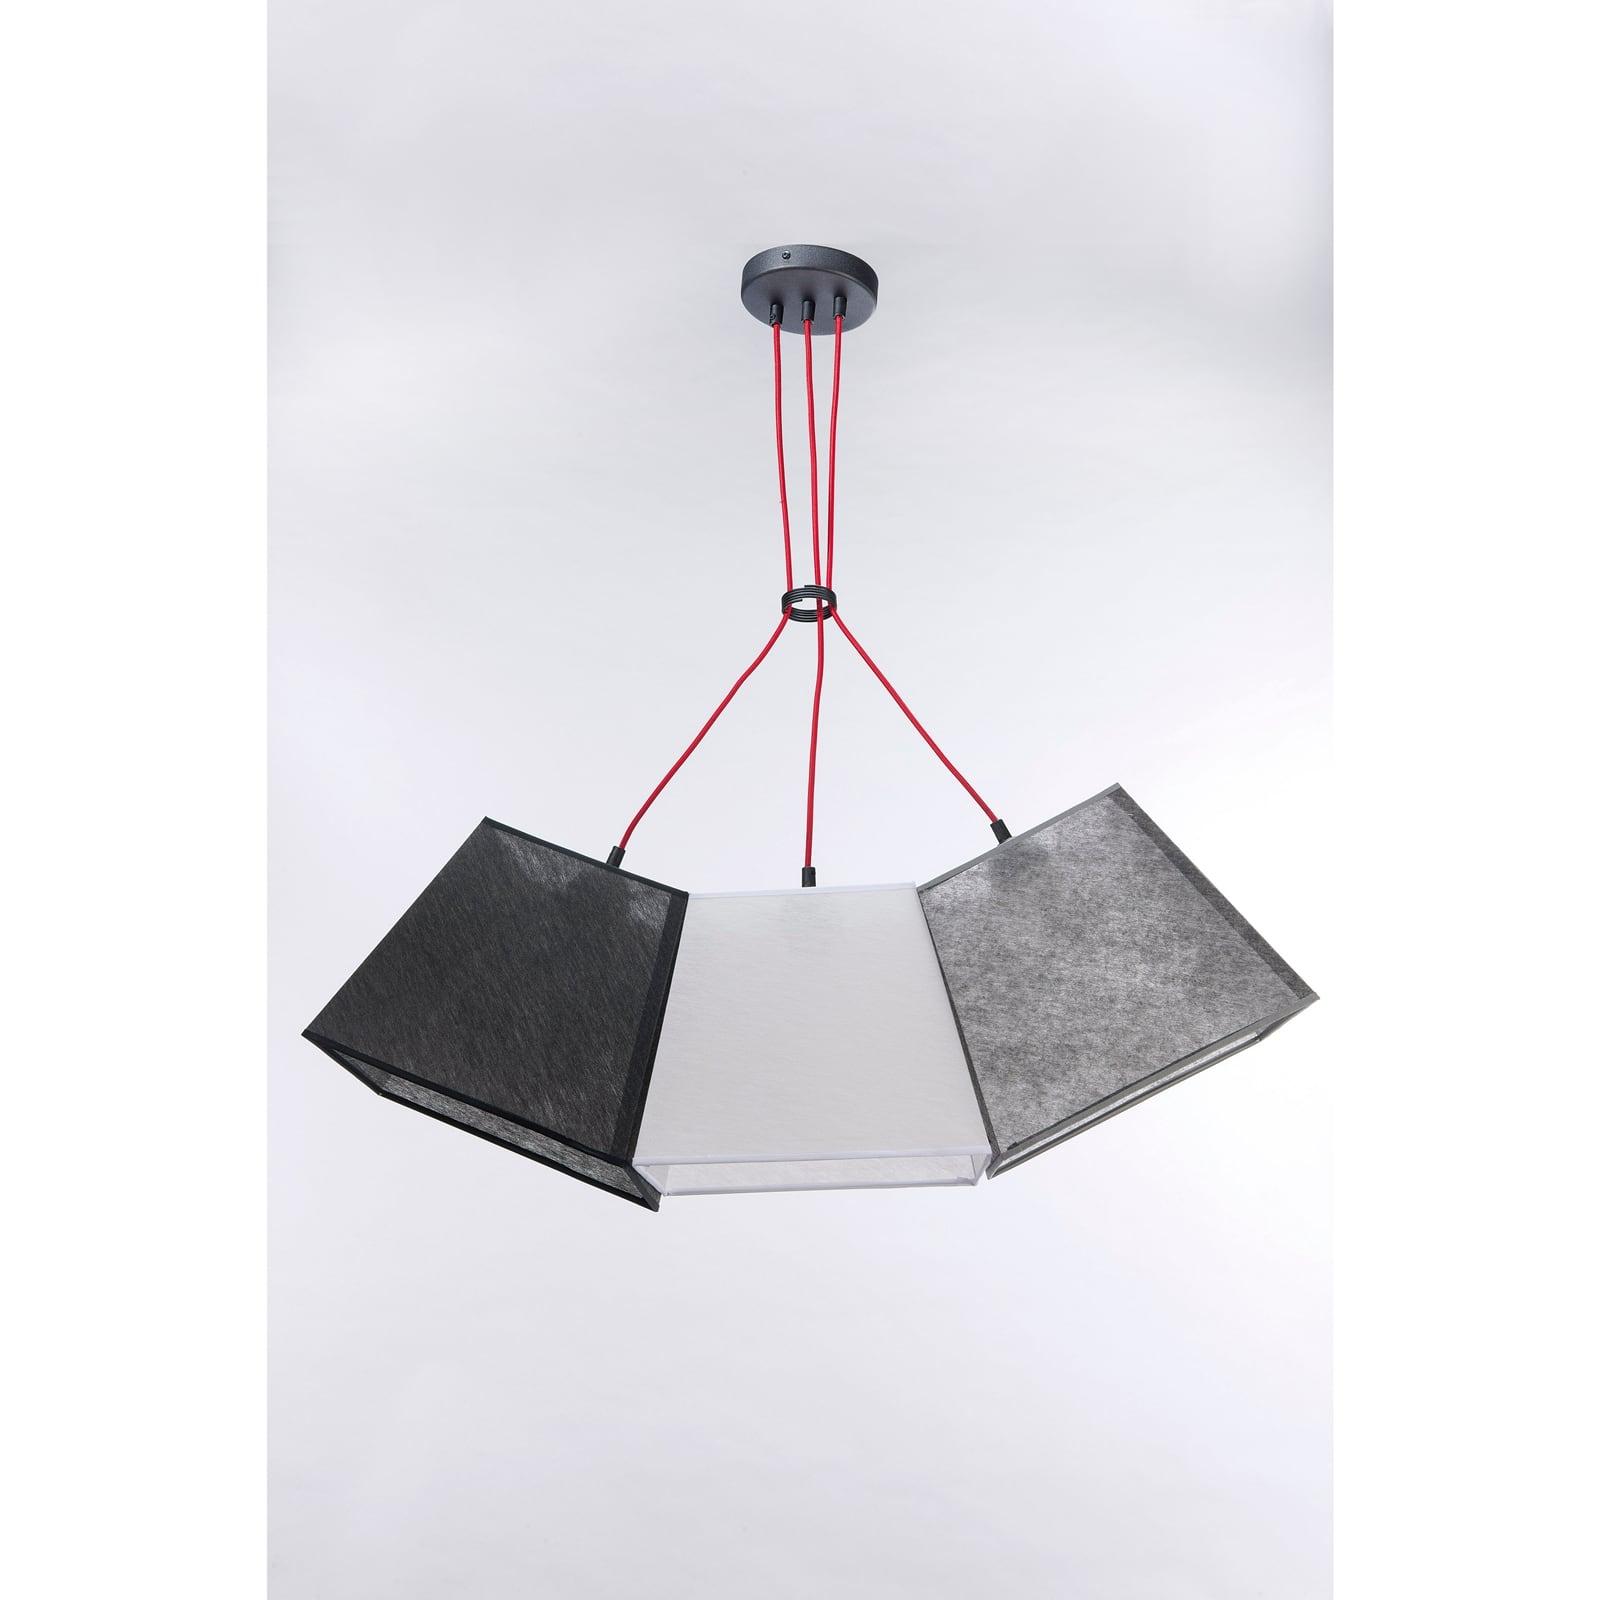 Hanging lamp WERDER 3 No. 3227